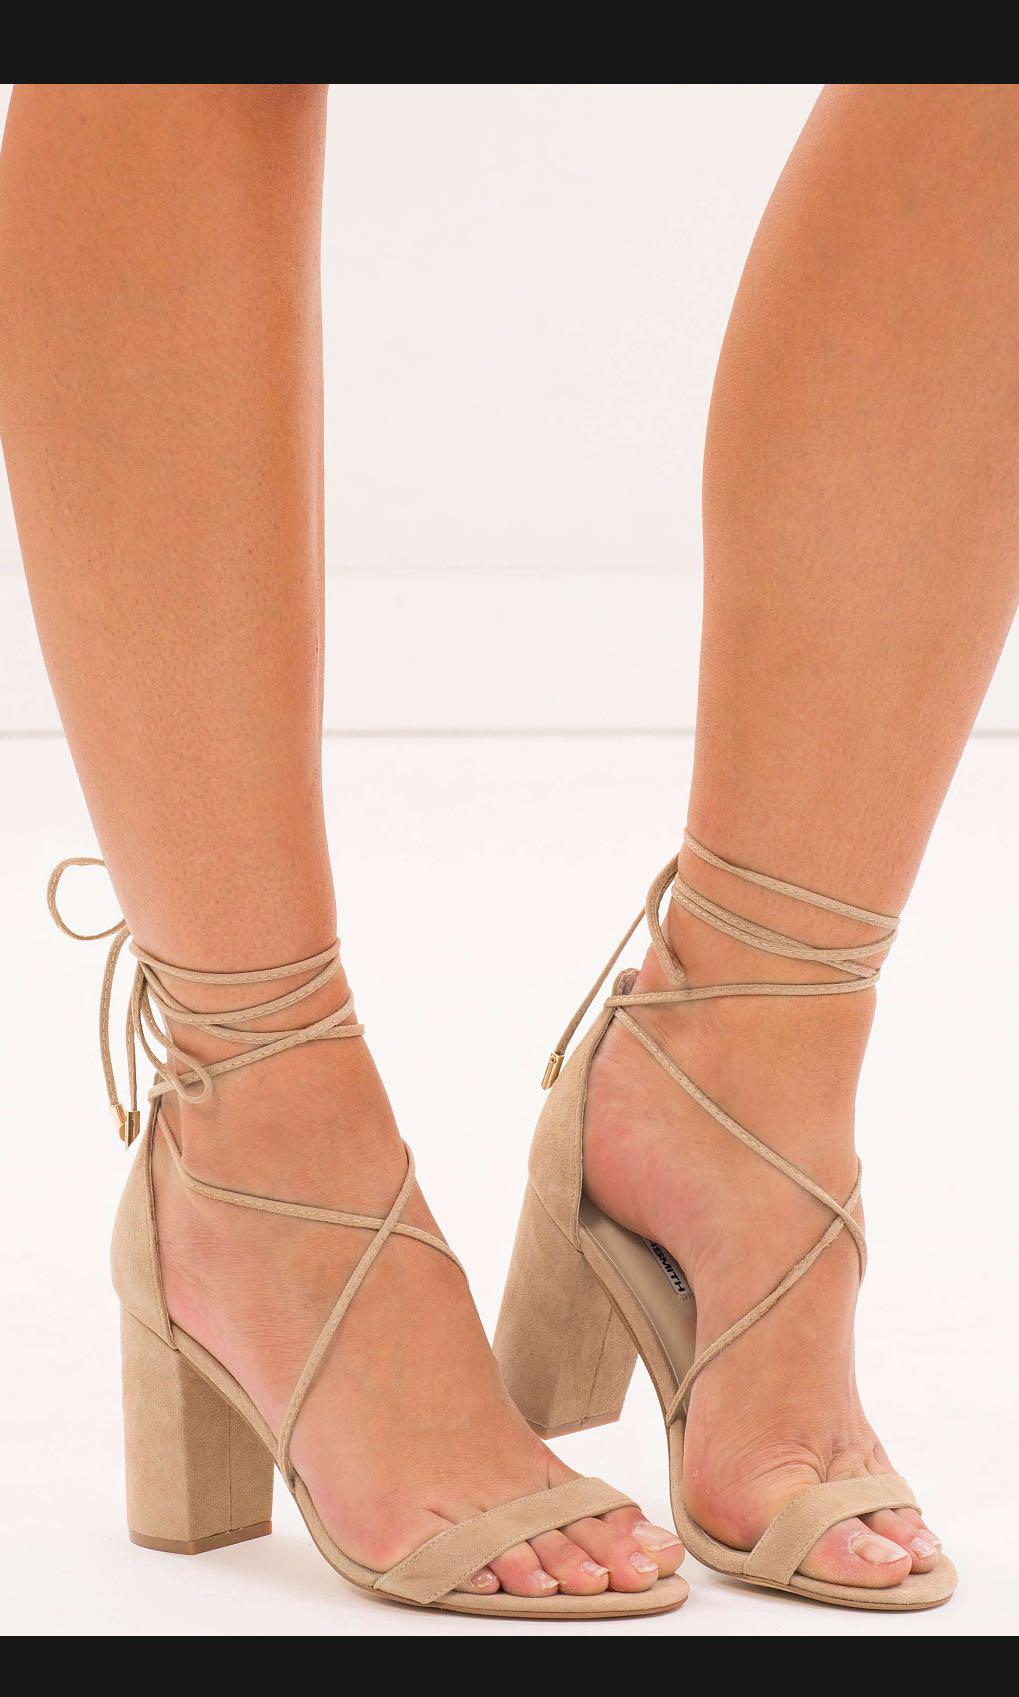 Windsor Smith Idina Lace Up Sandals